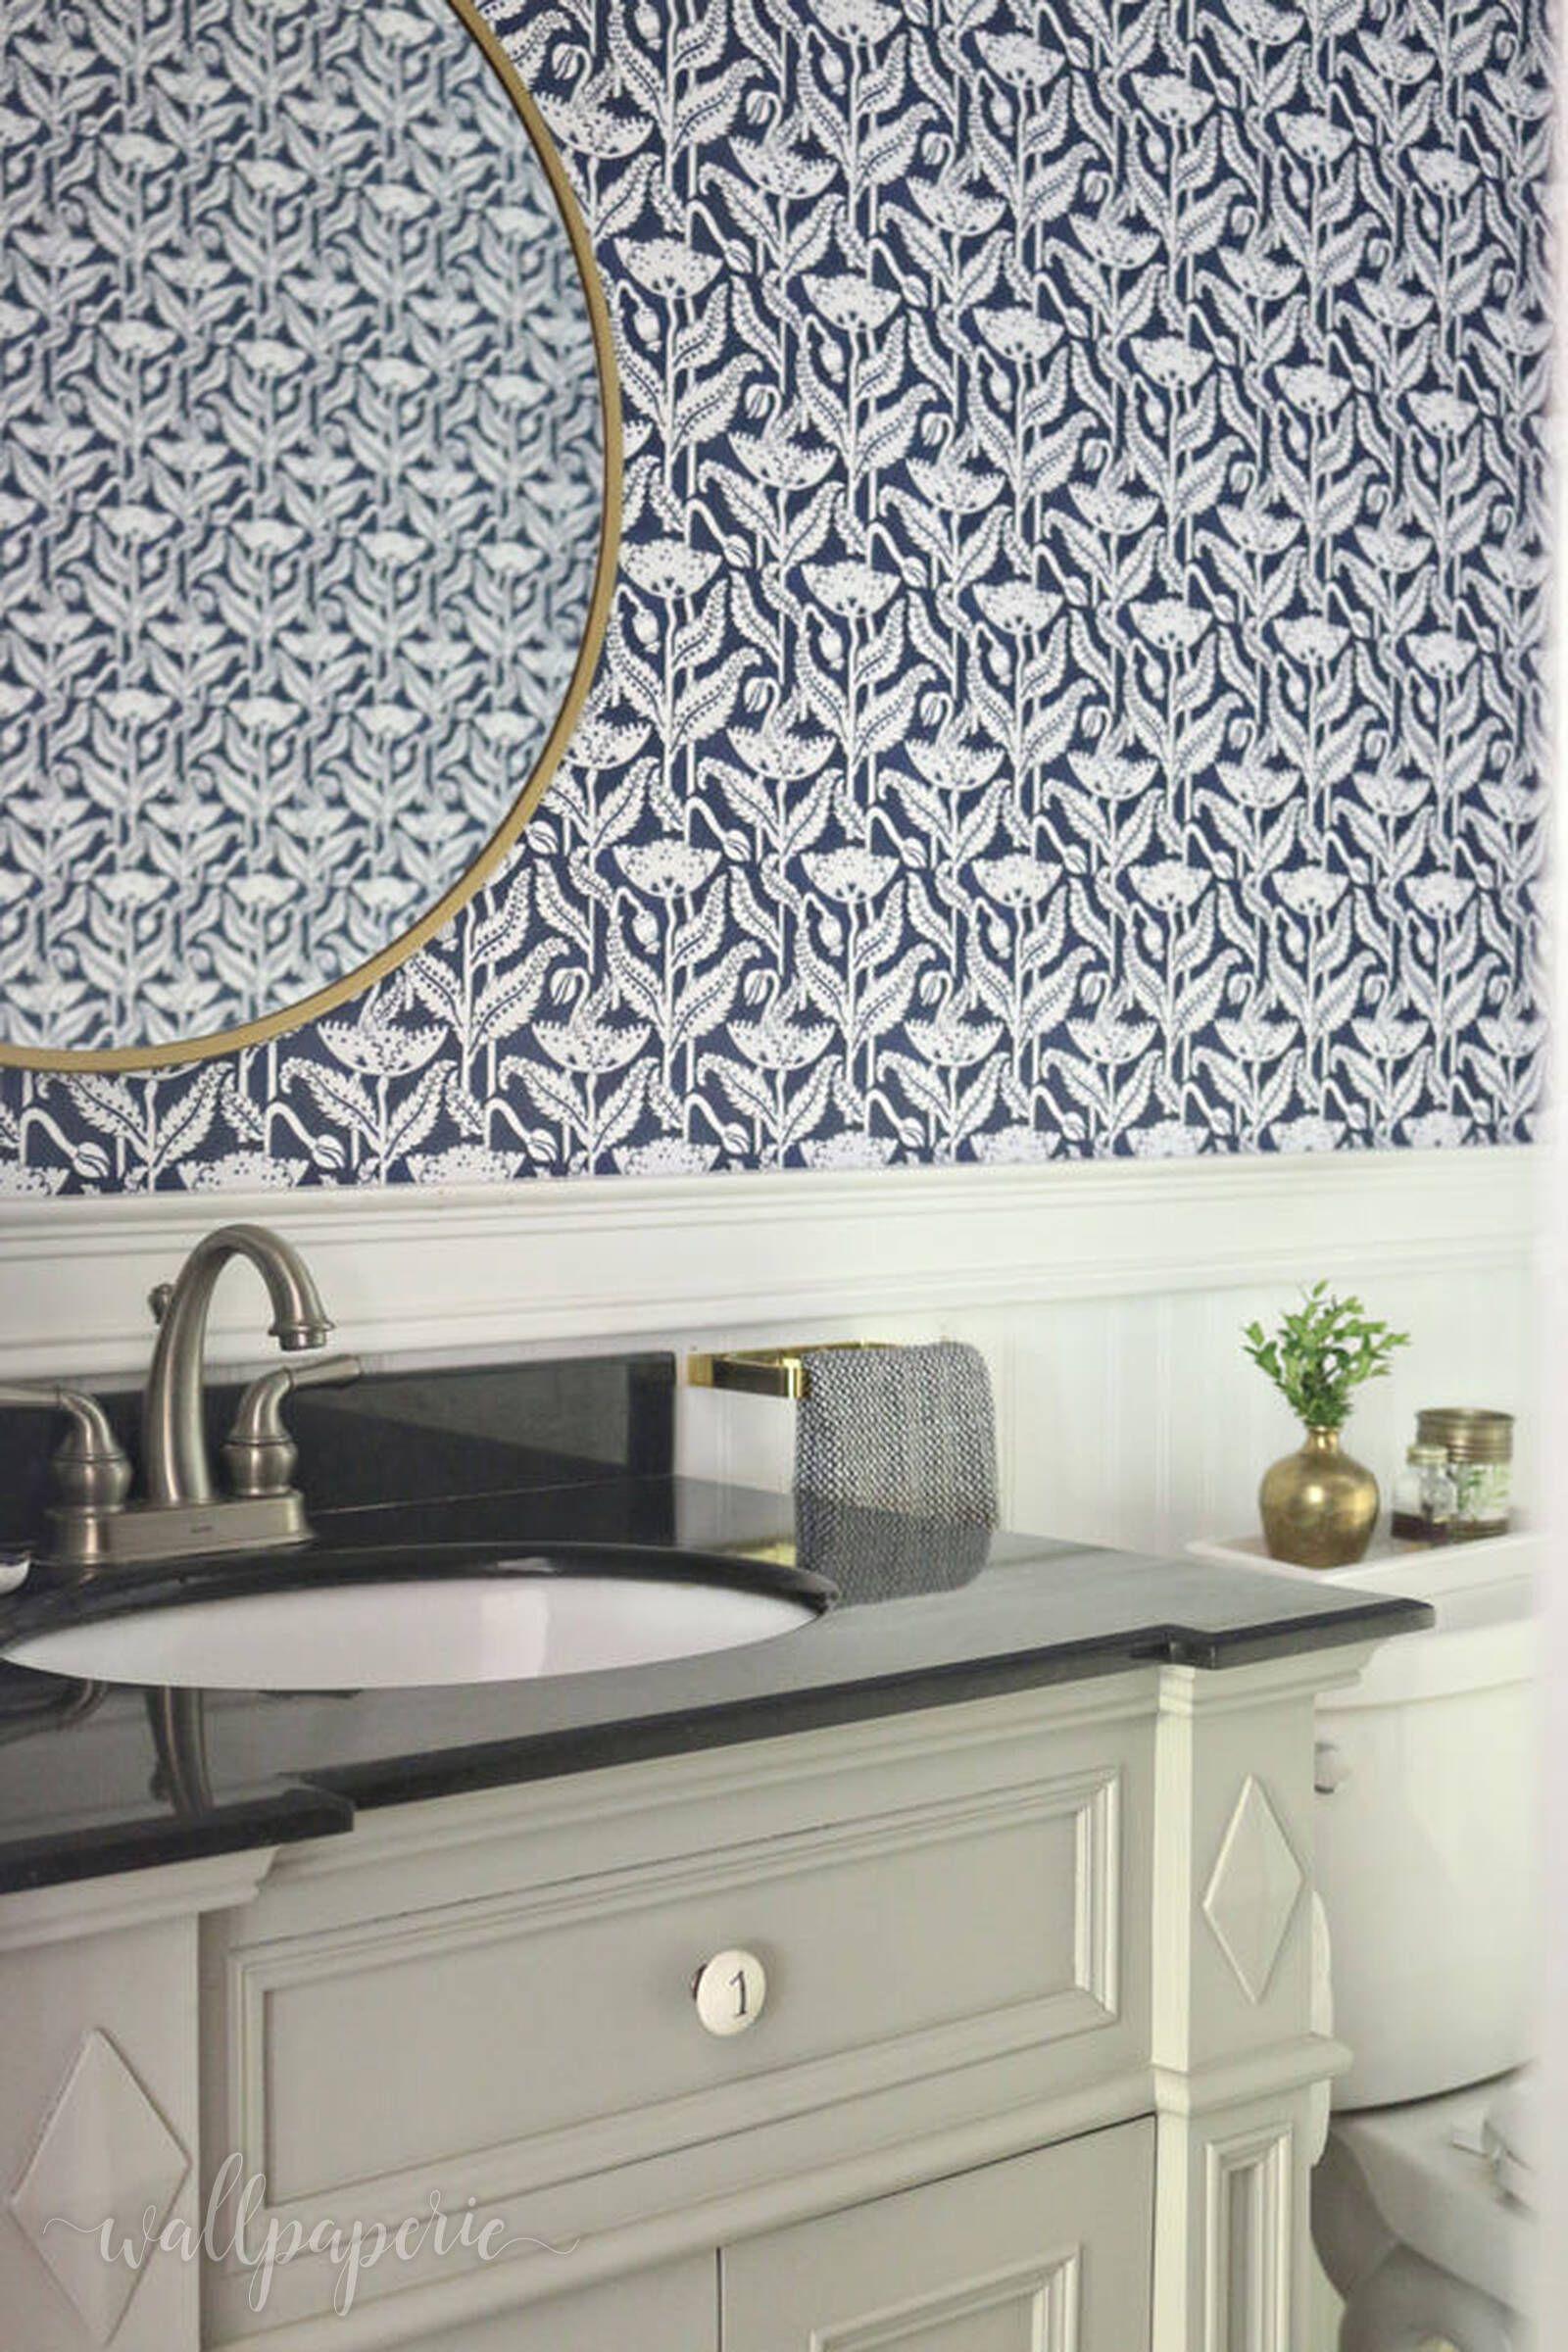 Vintage Poppy Navy Peel N Stick Wallpaper Bathroom Wallpaper Trends Removable Wallpaper